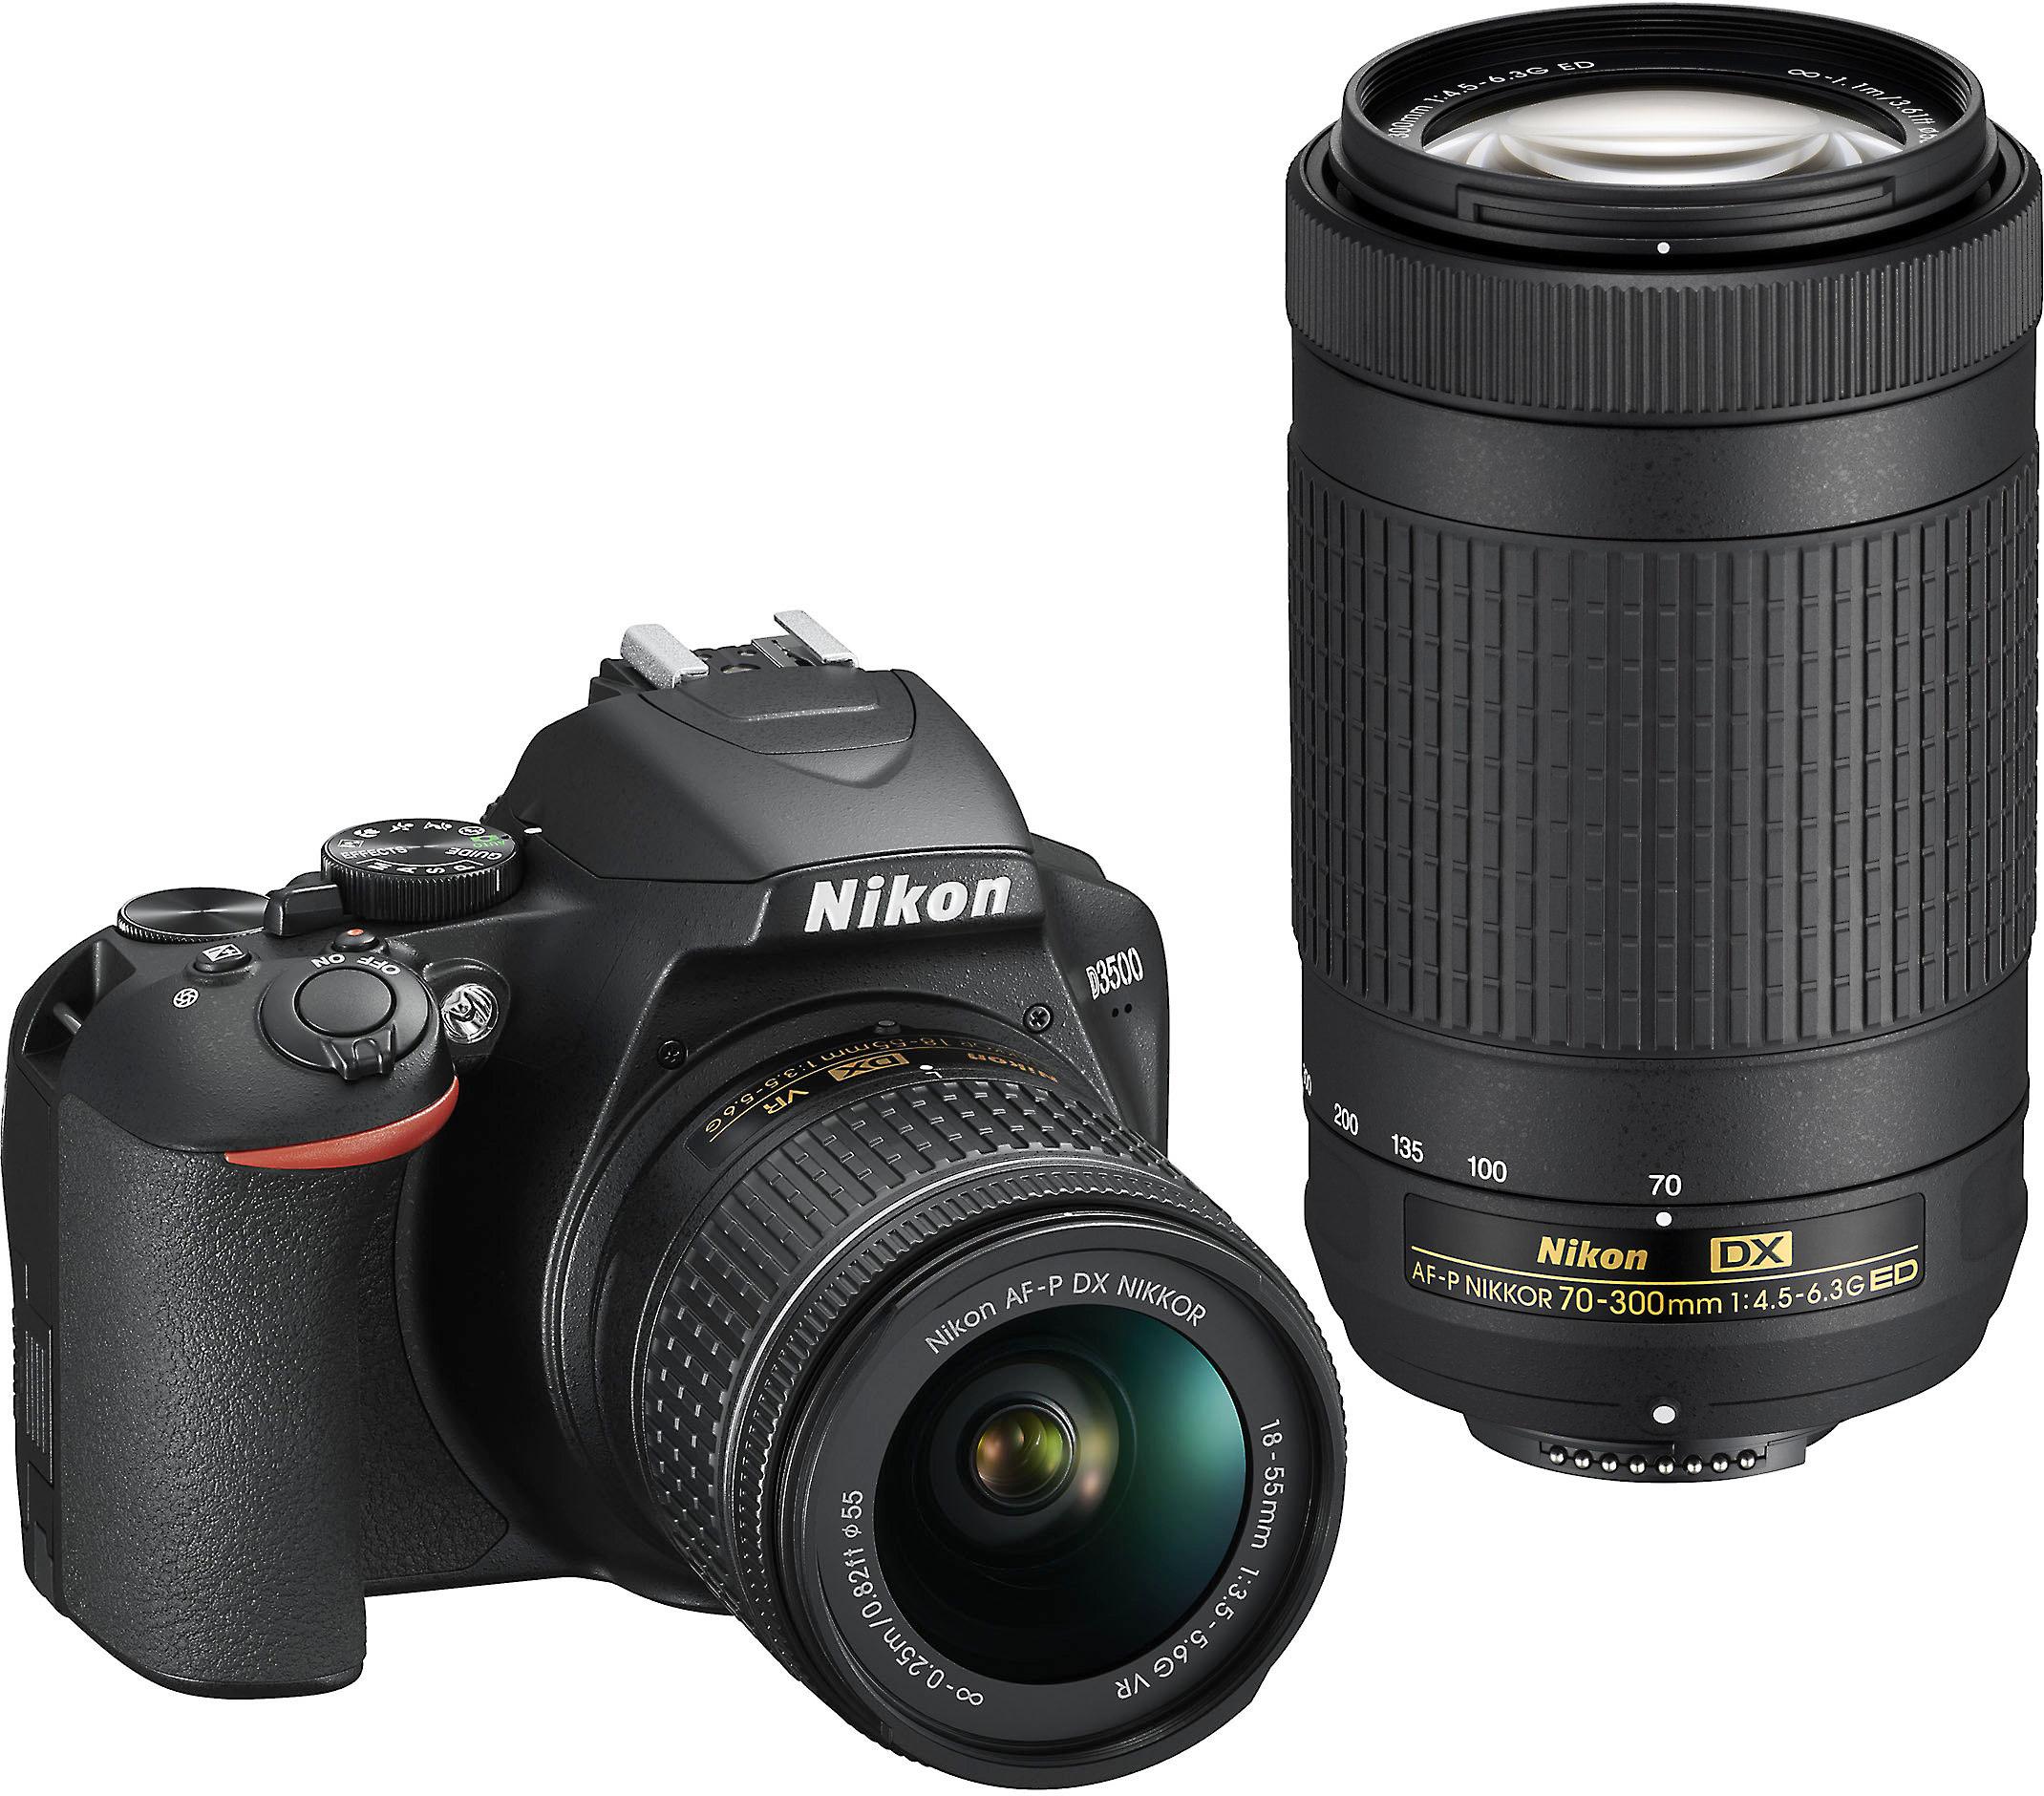 Nikon DSLR Cameras at Crutchfield